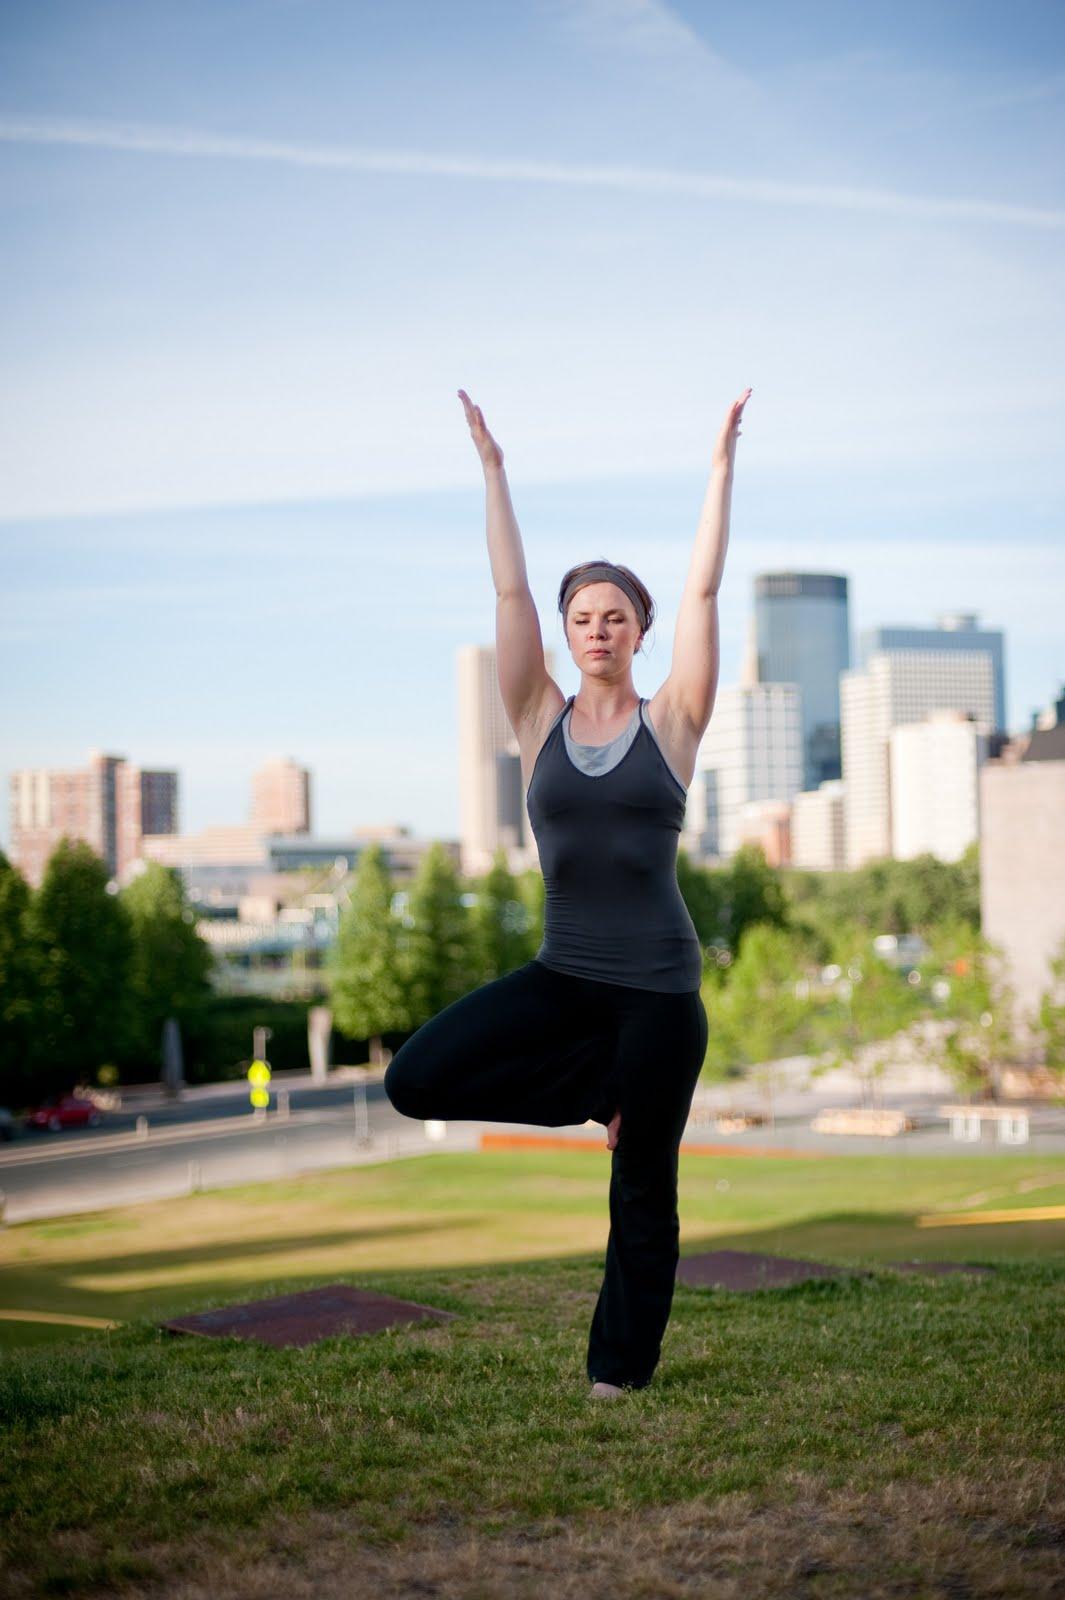 Haley - Yoga - [Lifestyle Photography] - Laura Radniecki ...